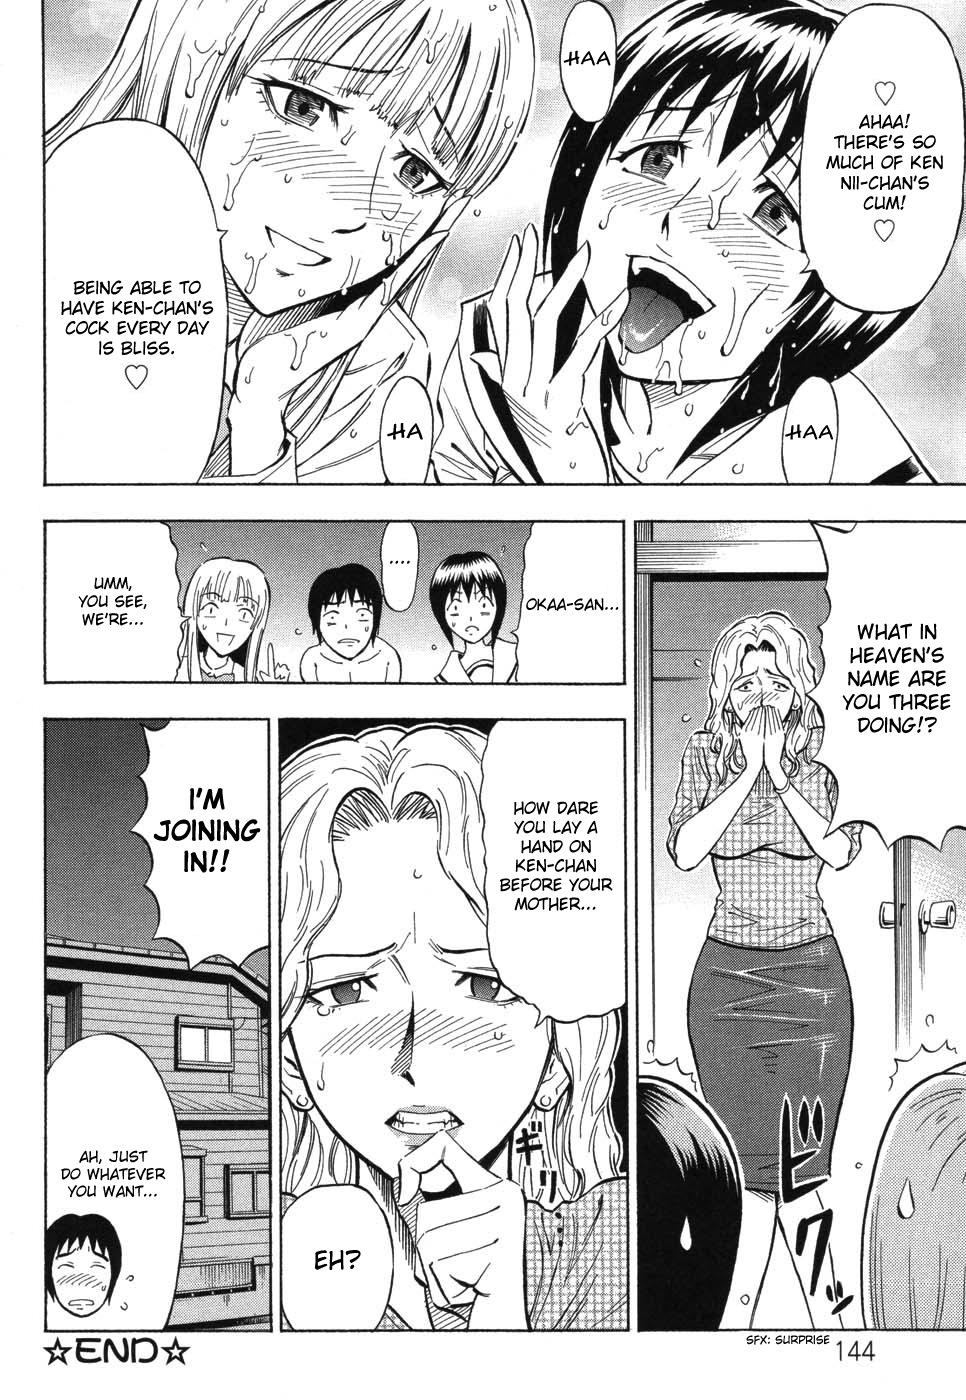 sluts queen size mom sister are and Ichigo darling in the franx